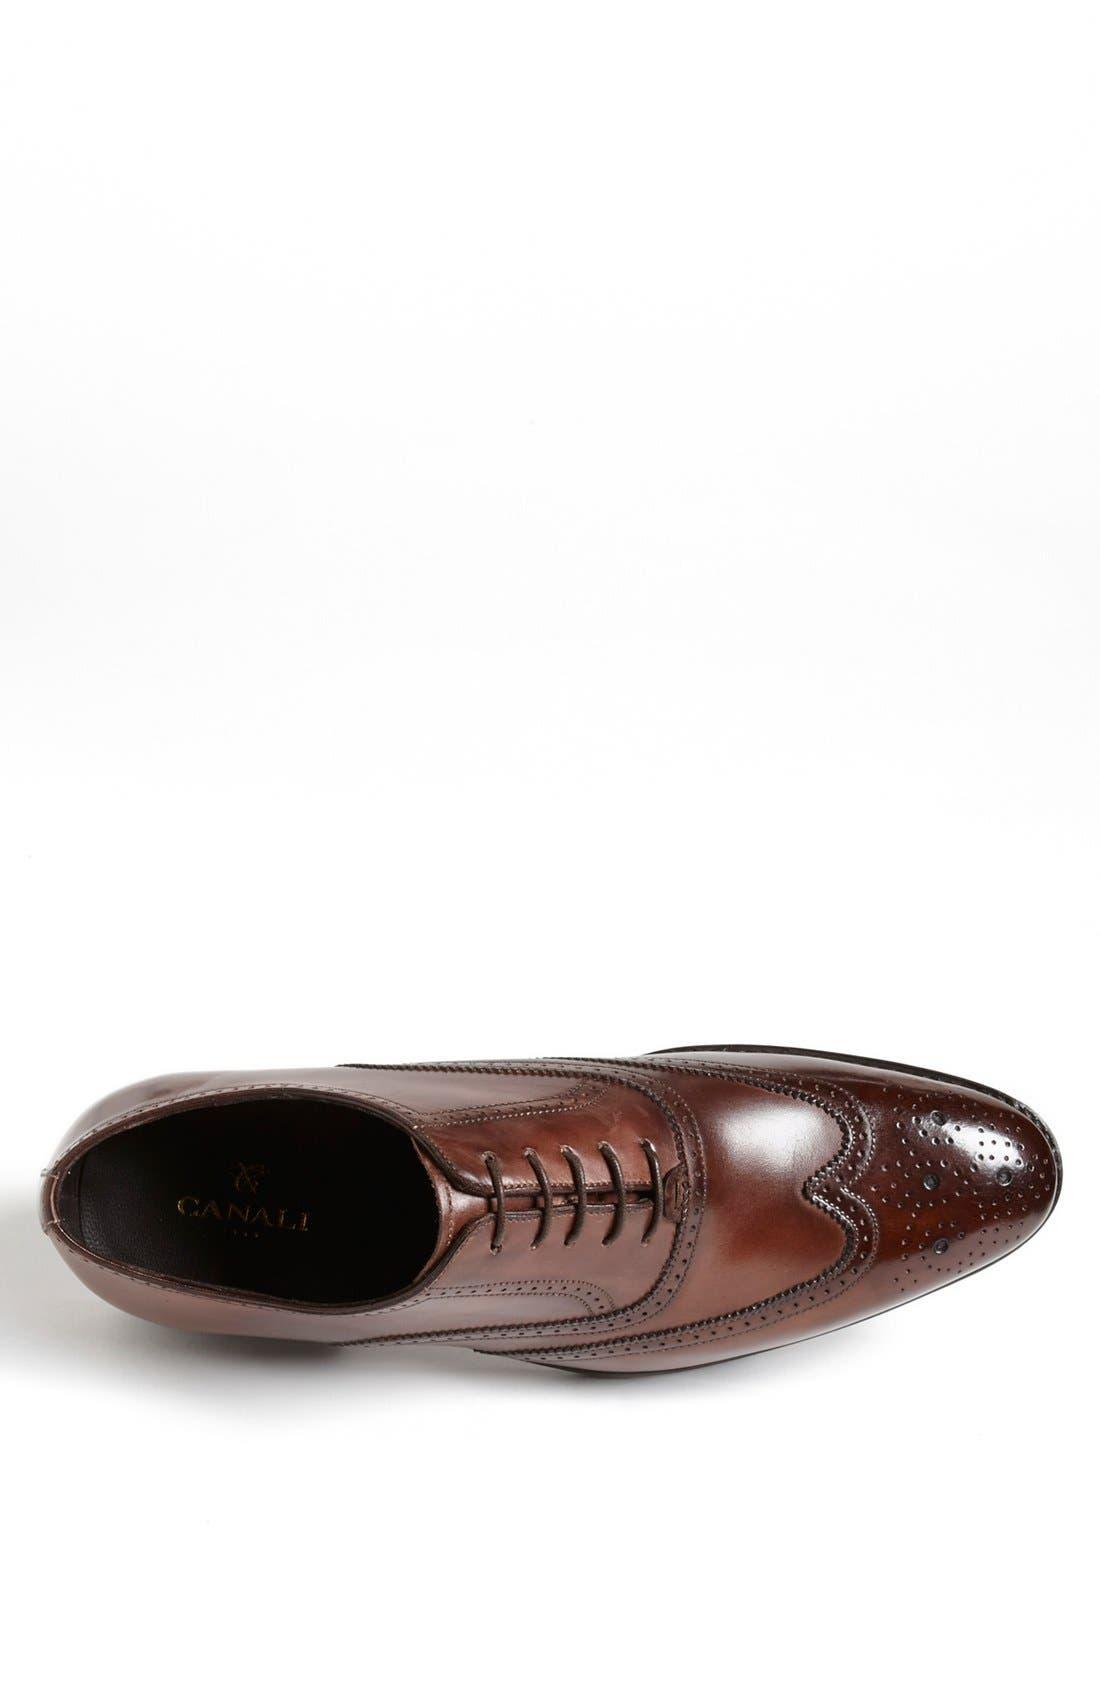 Alternate Image 3  - Canali Leather Wingtip (Men)